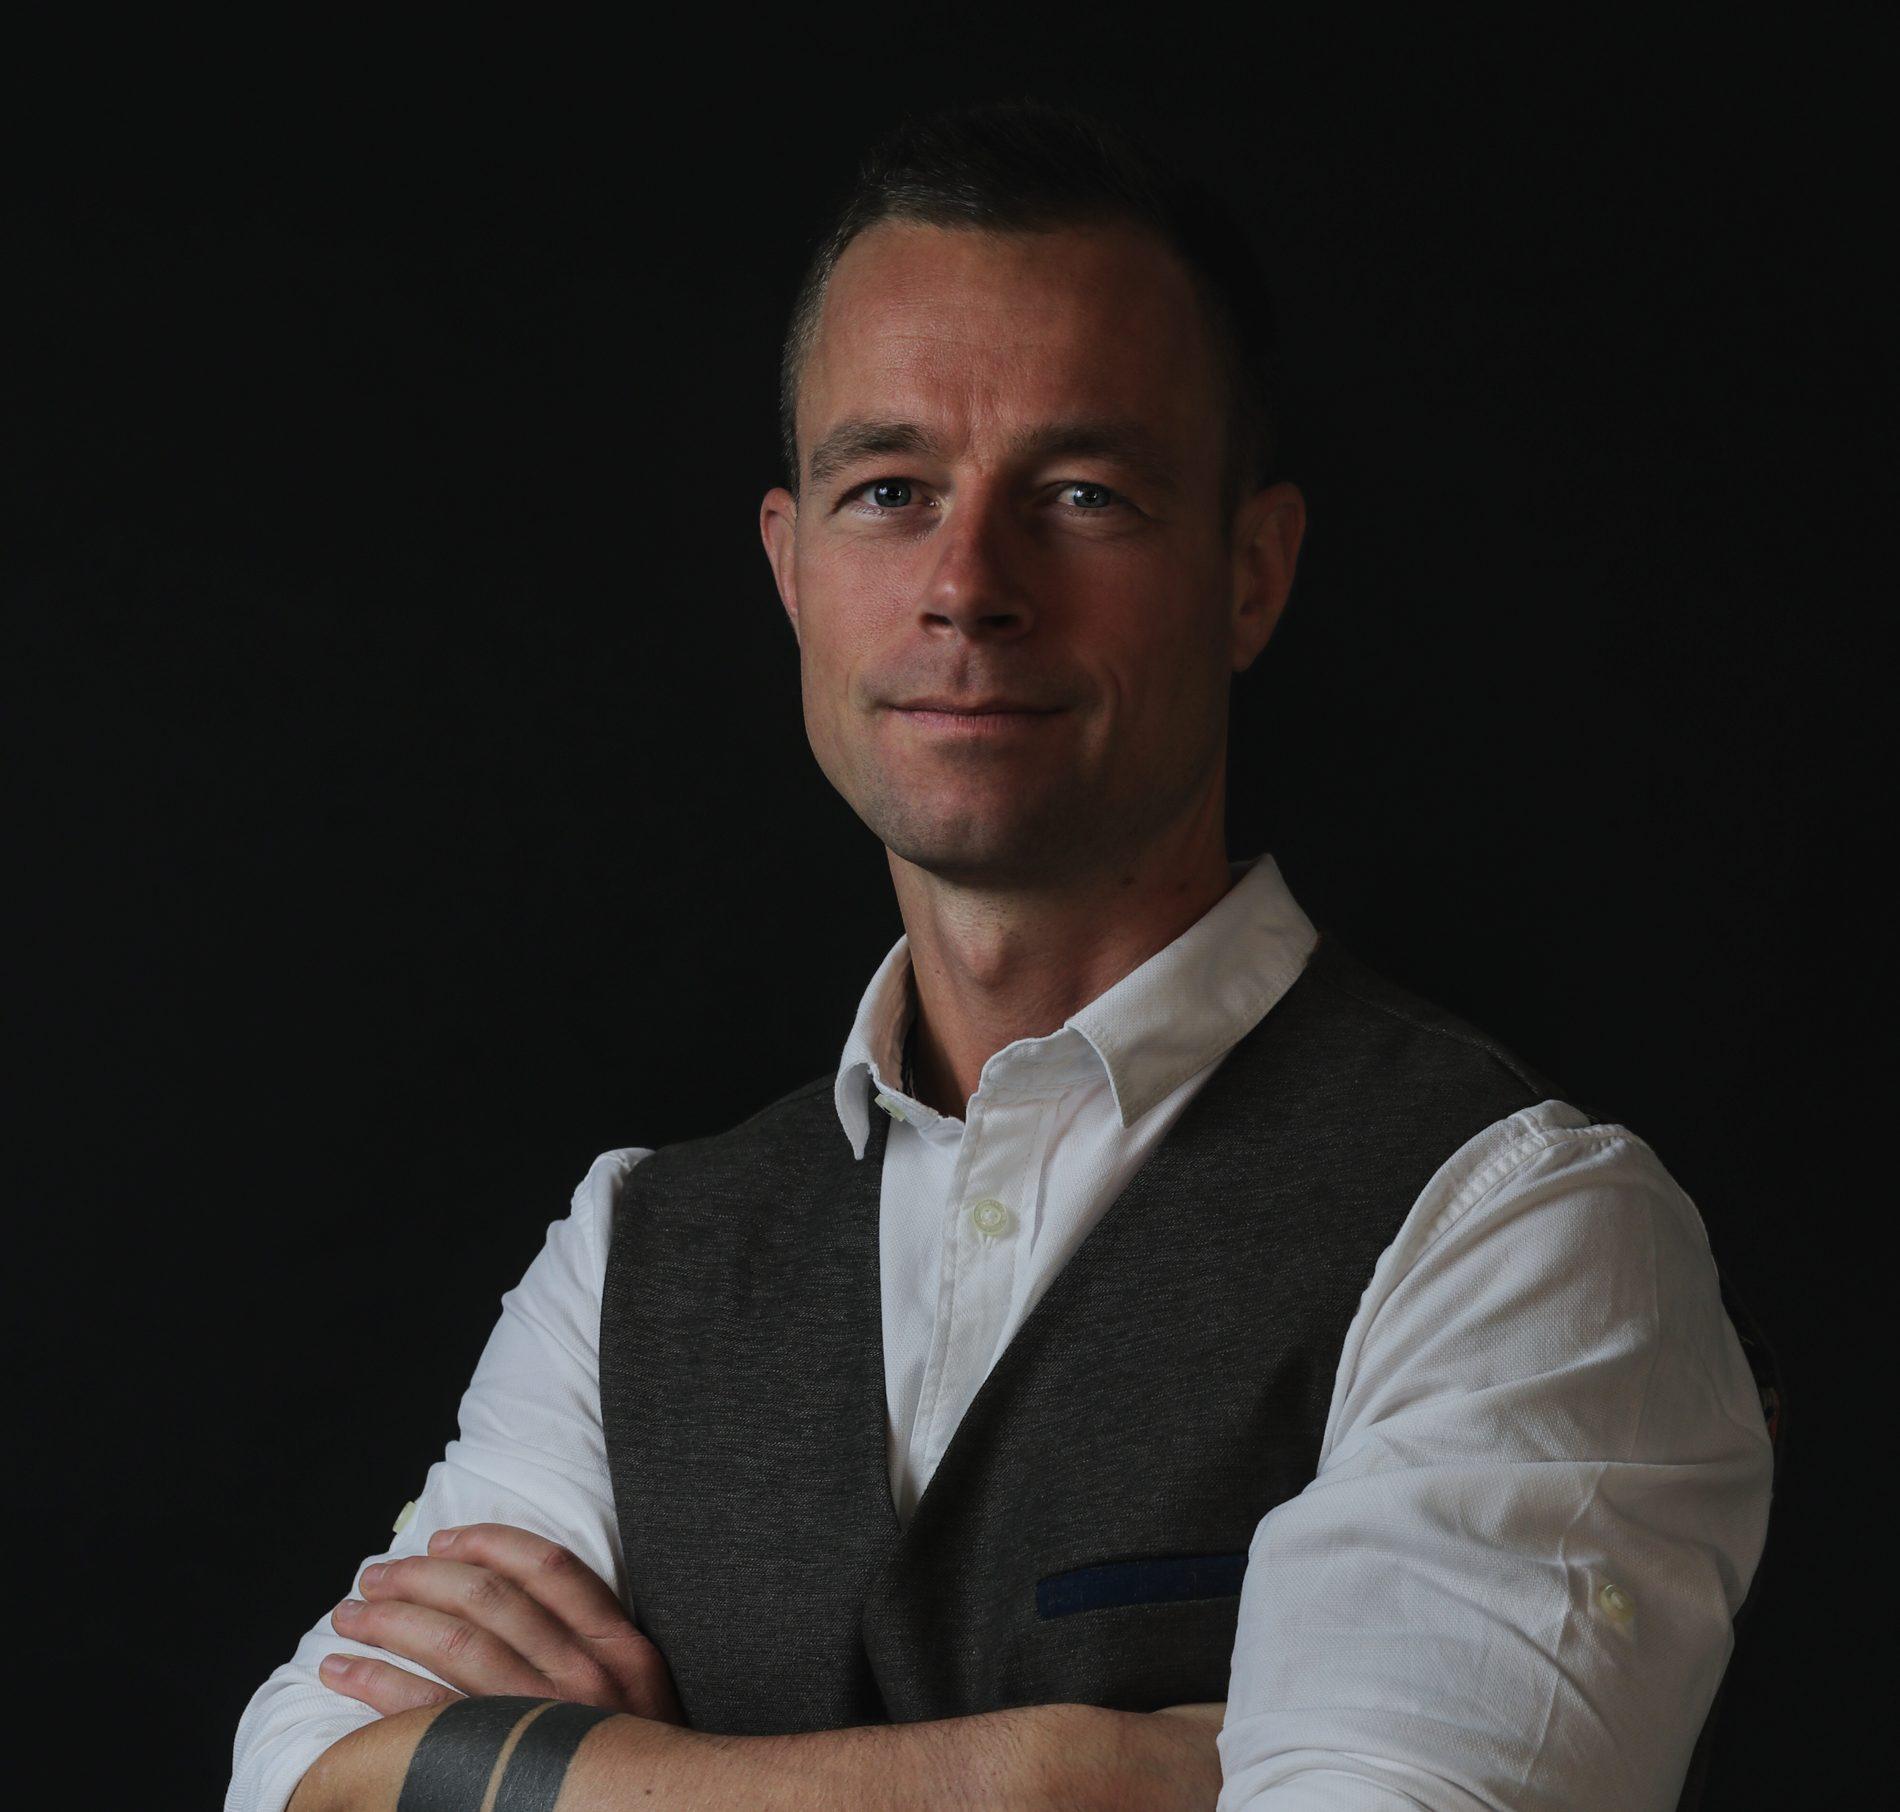 Jan Willem den Hollander